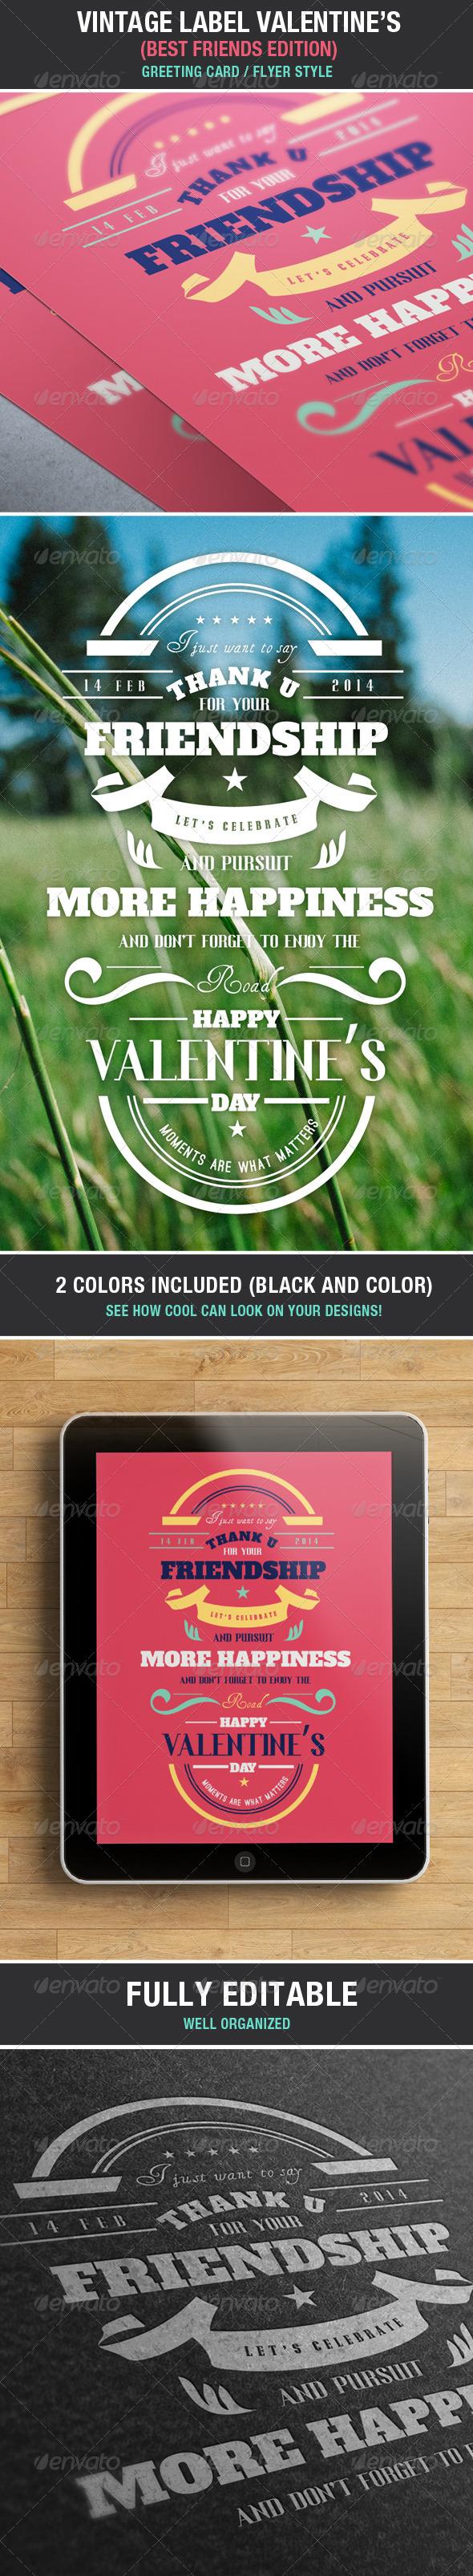 Vintage Label Friends & Love Valentine's Edition - Badges & Stickers Web Elements